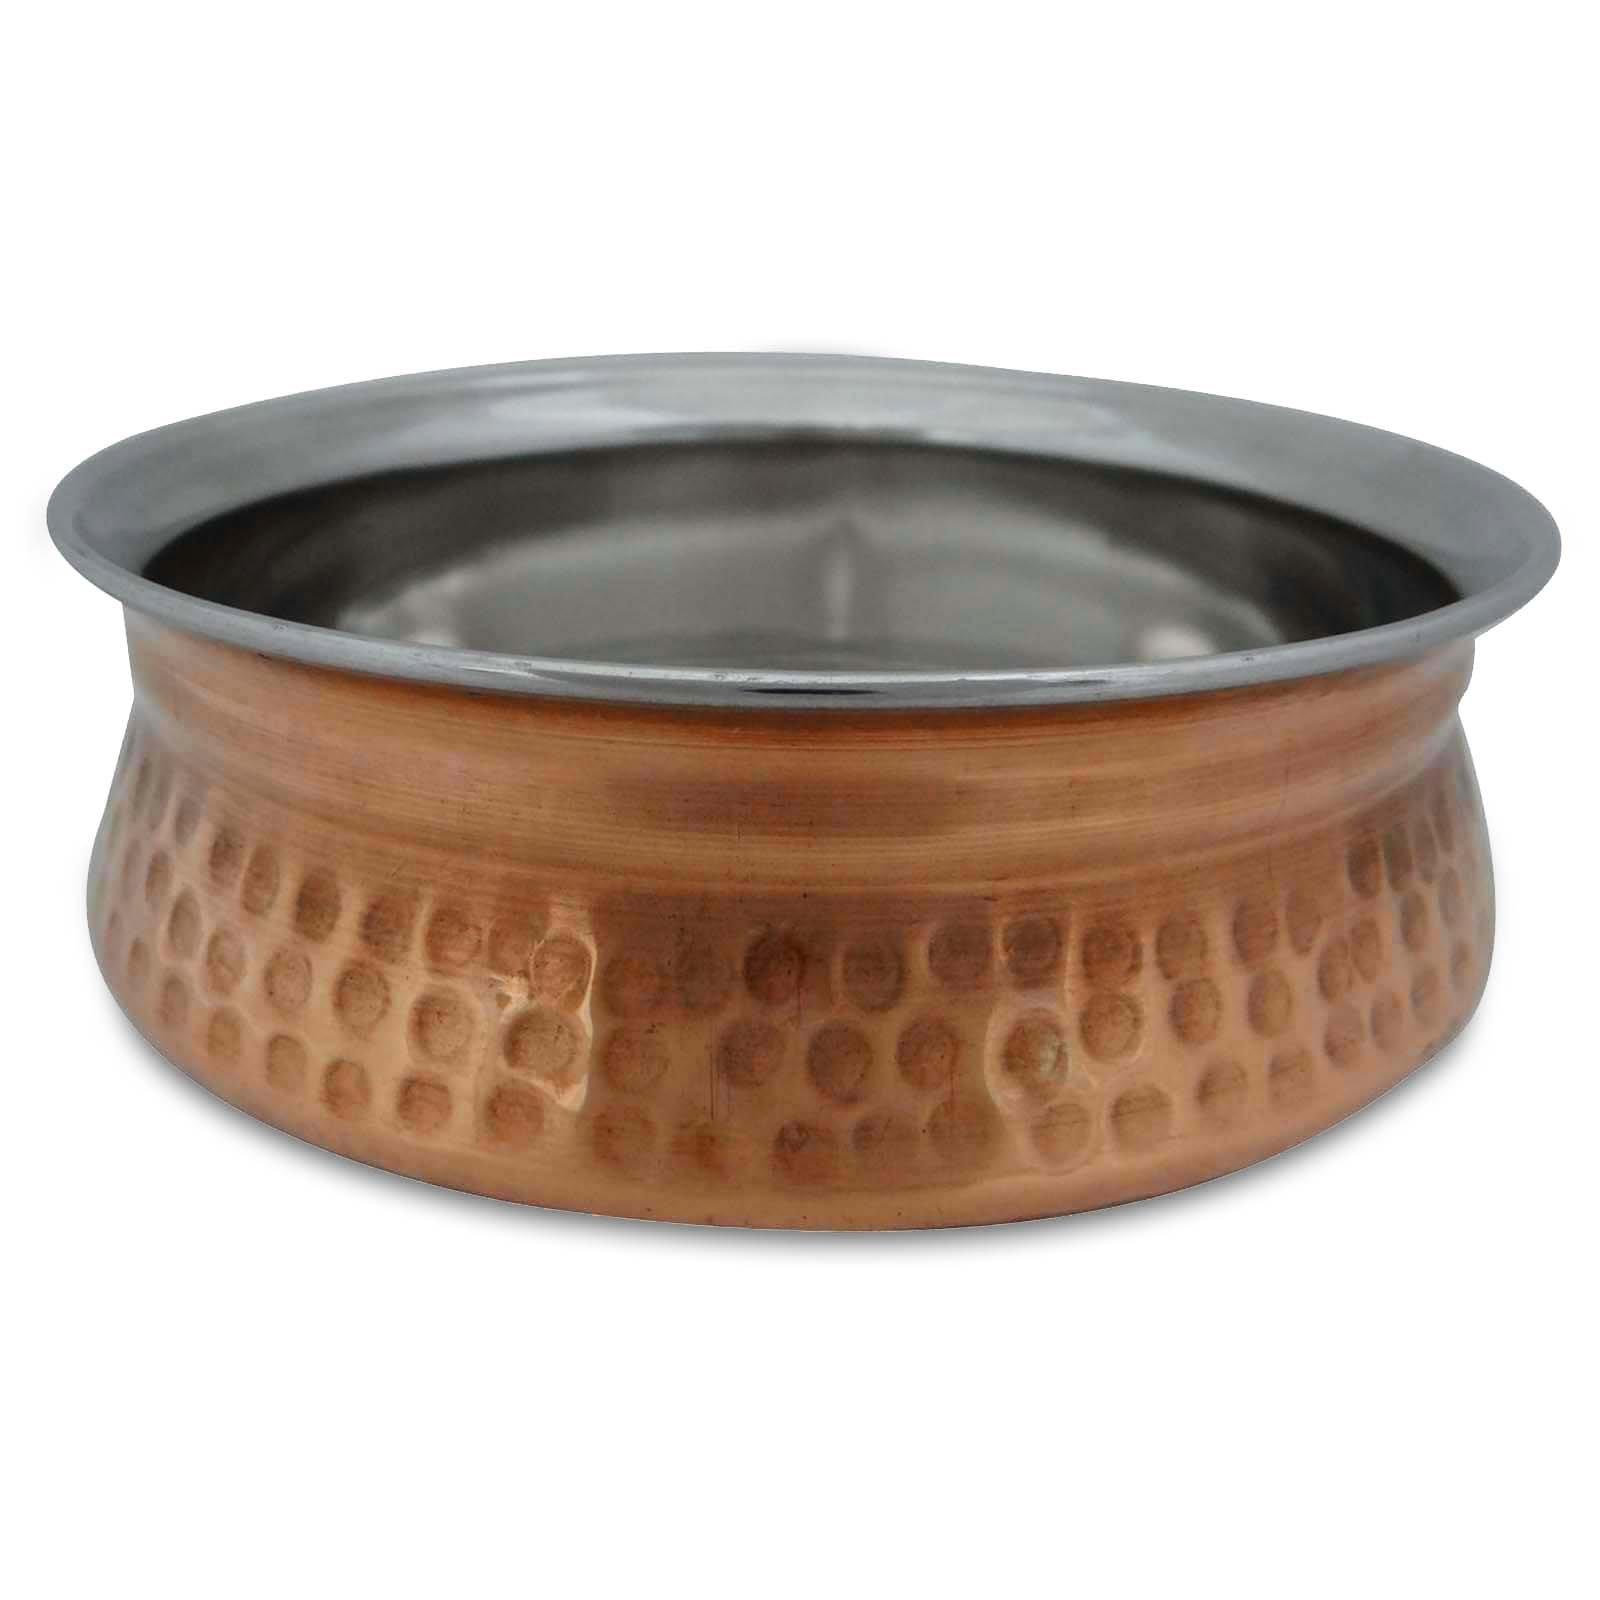 Copper Steel Serving Bowl Kitchen Dinnerware Utensil Tableware India